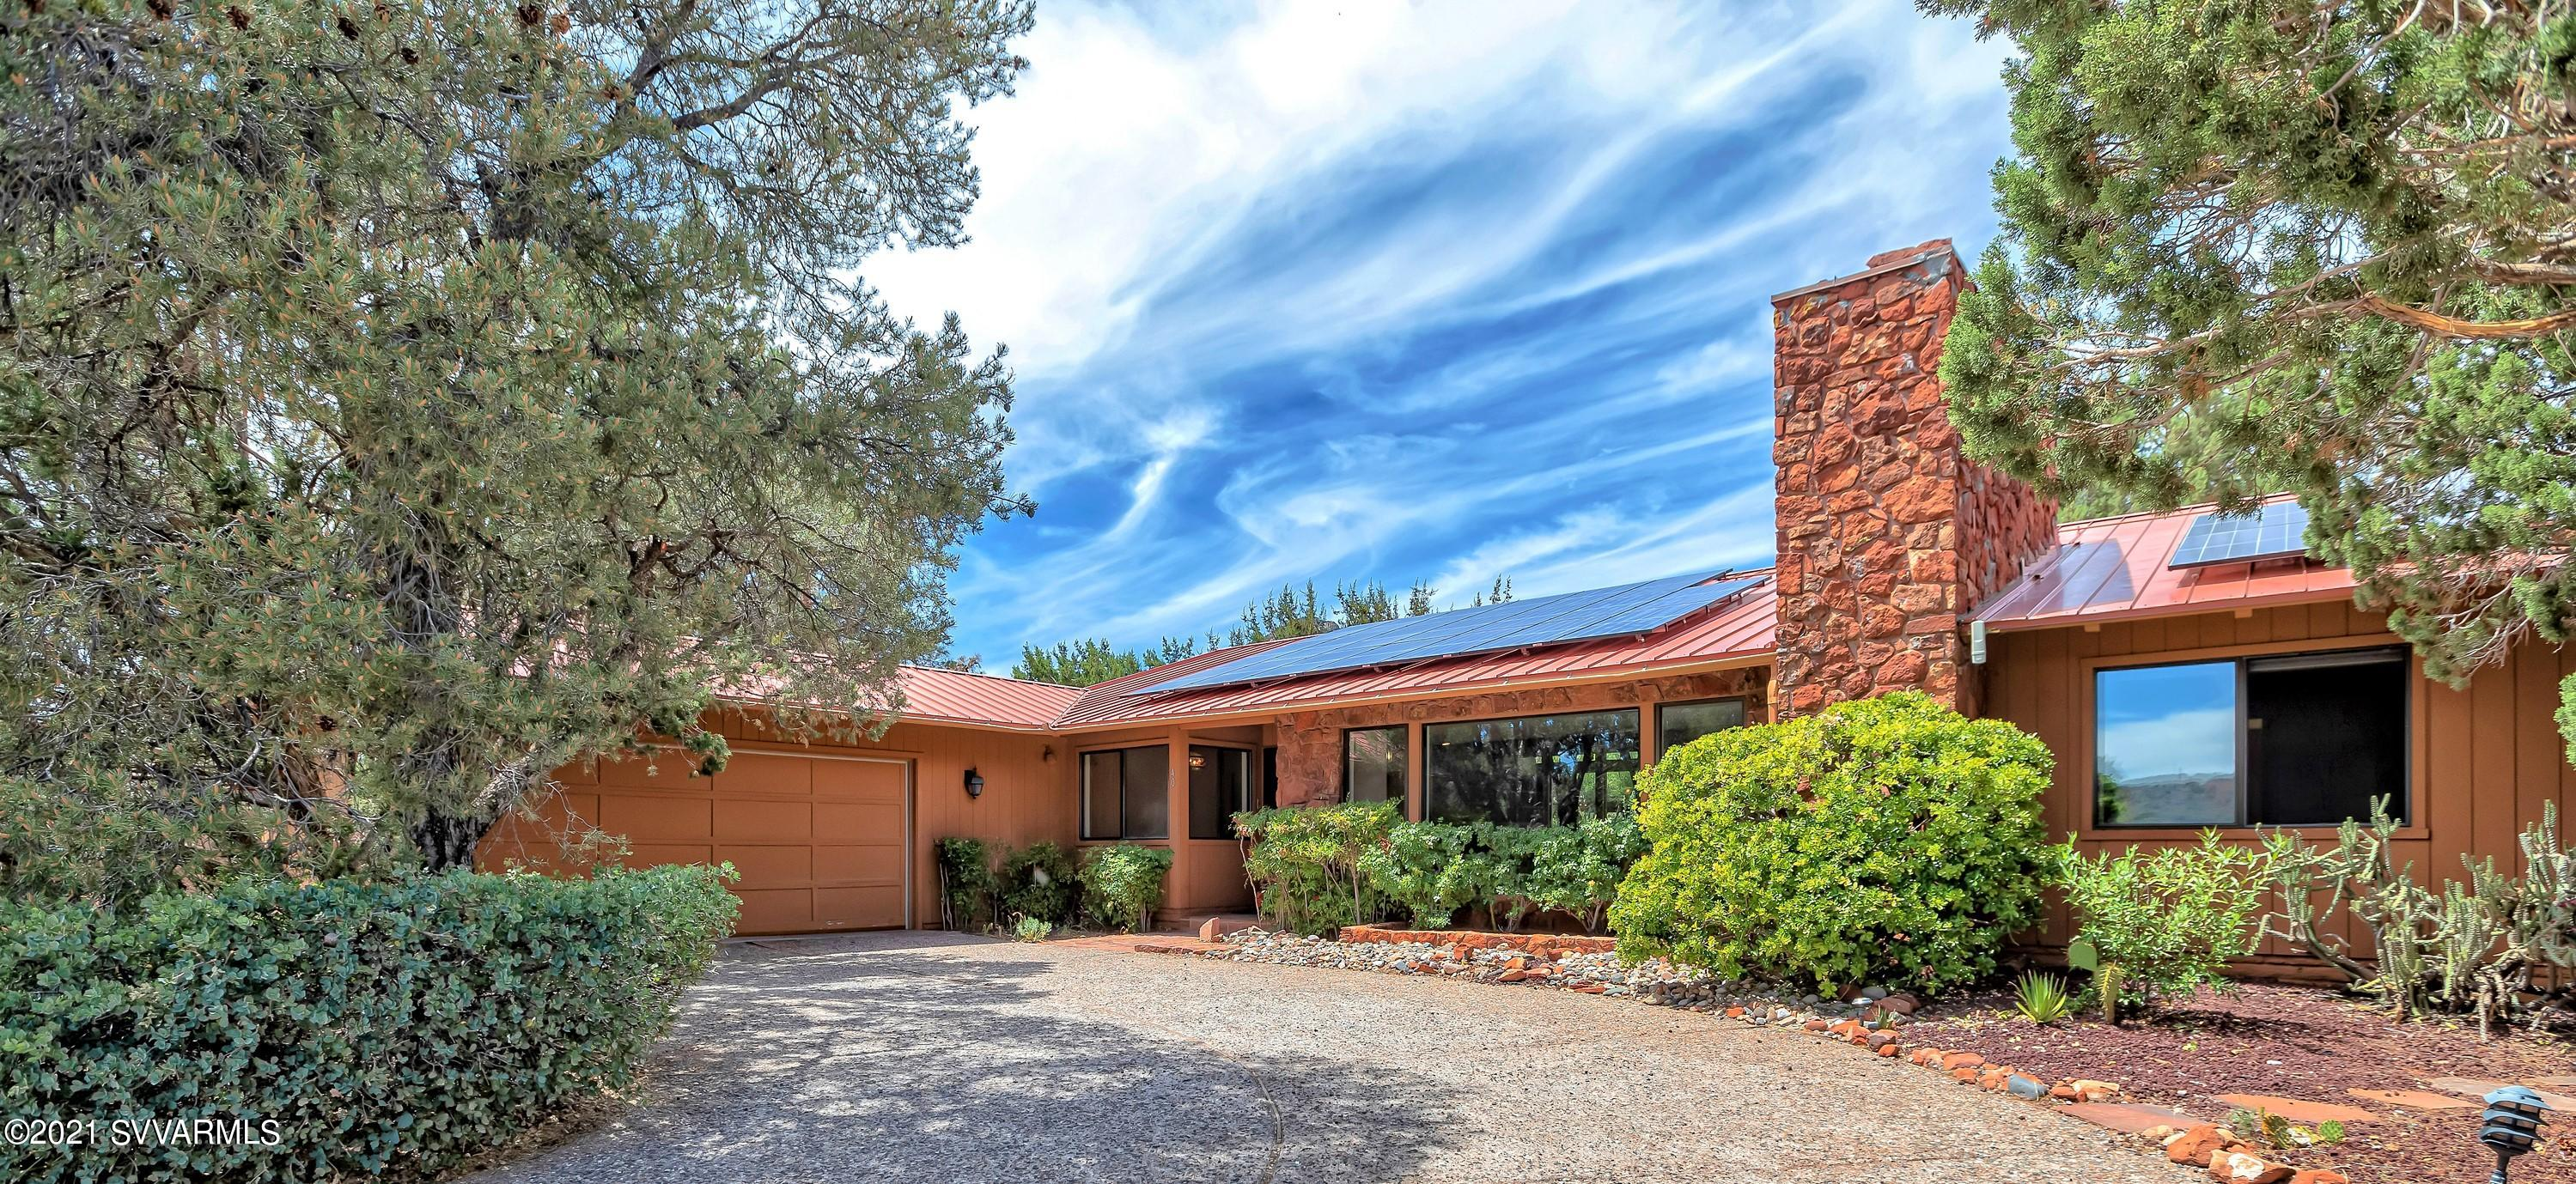 40 Mission Rd Sedona, AZ 86336